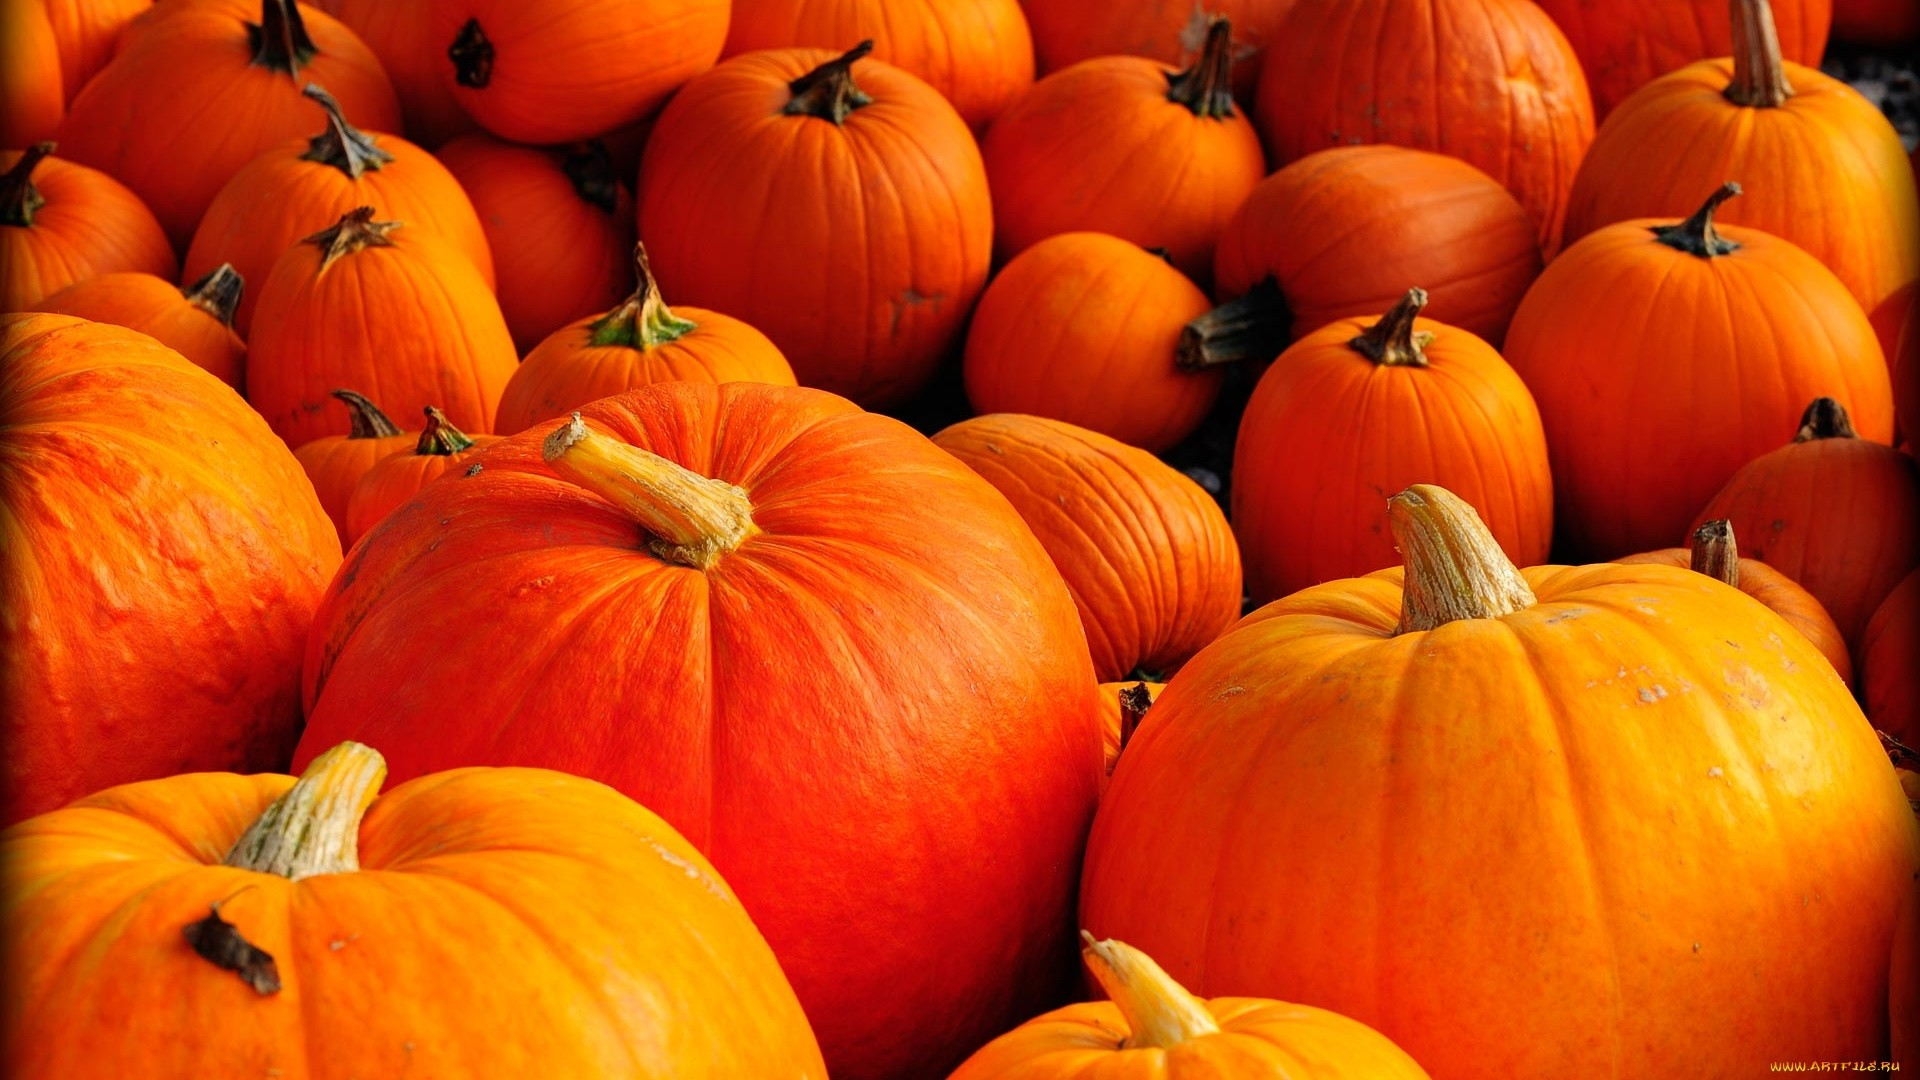 Pumpkin PC Wallpaper HD